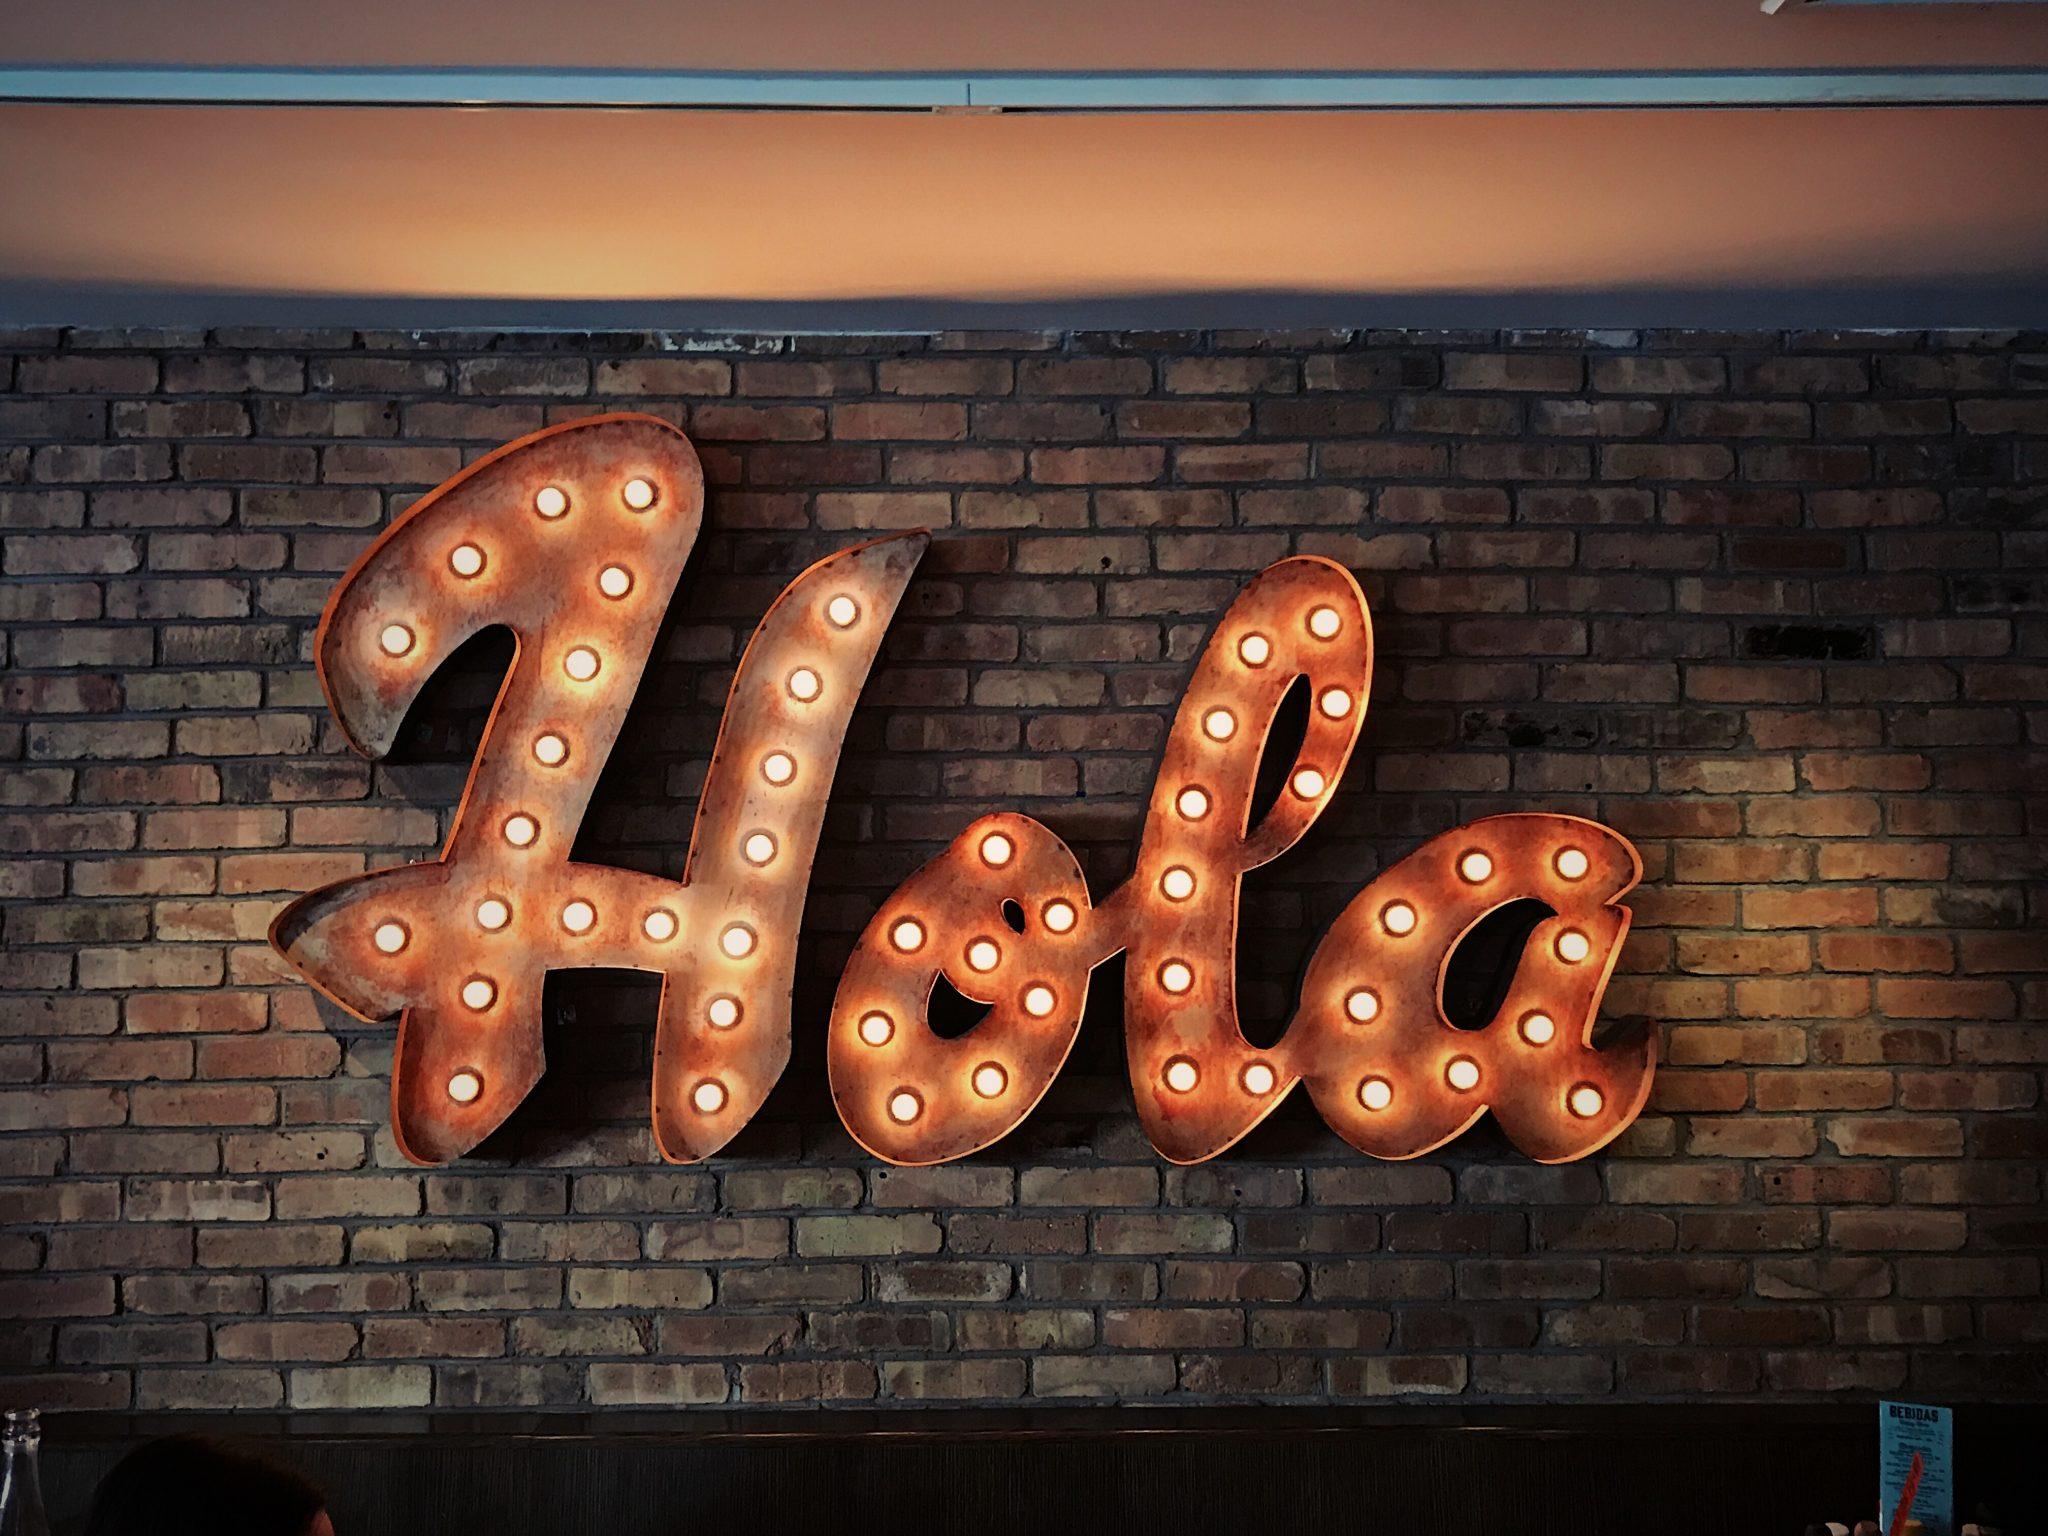 How do you say hello?